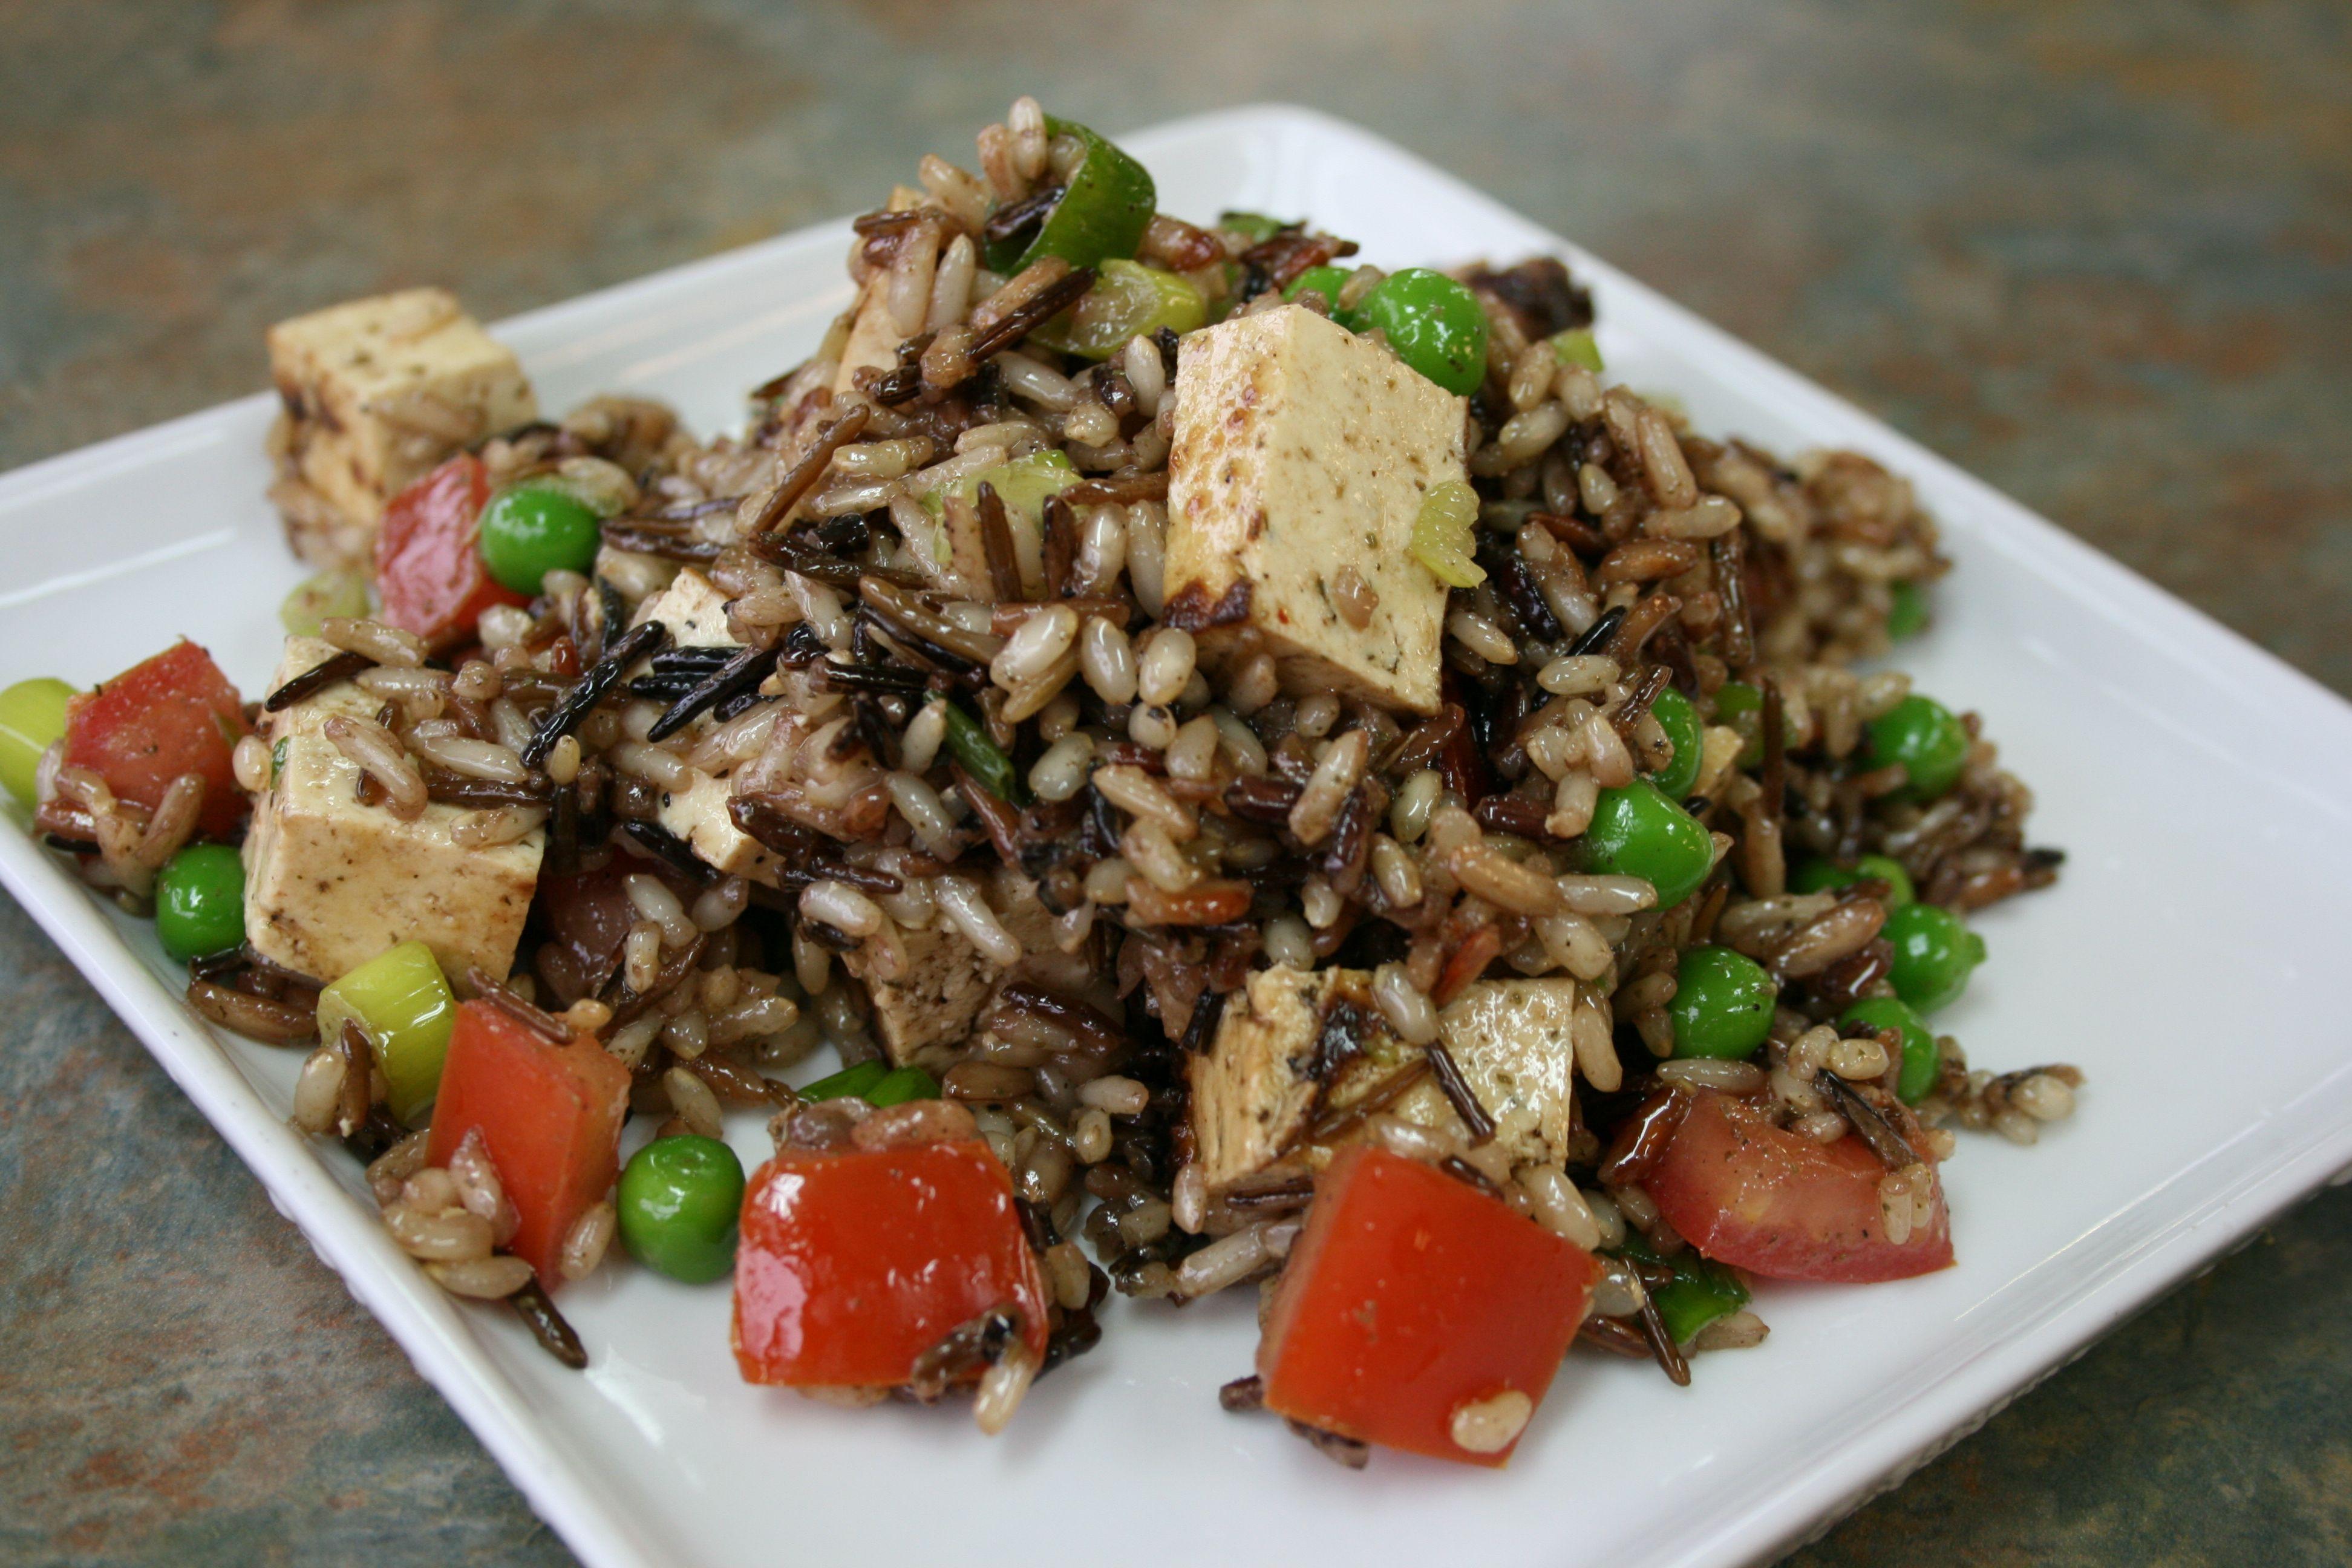 Lassens deli wild summer rice food